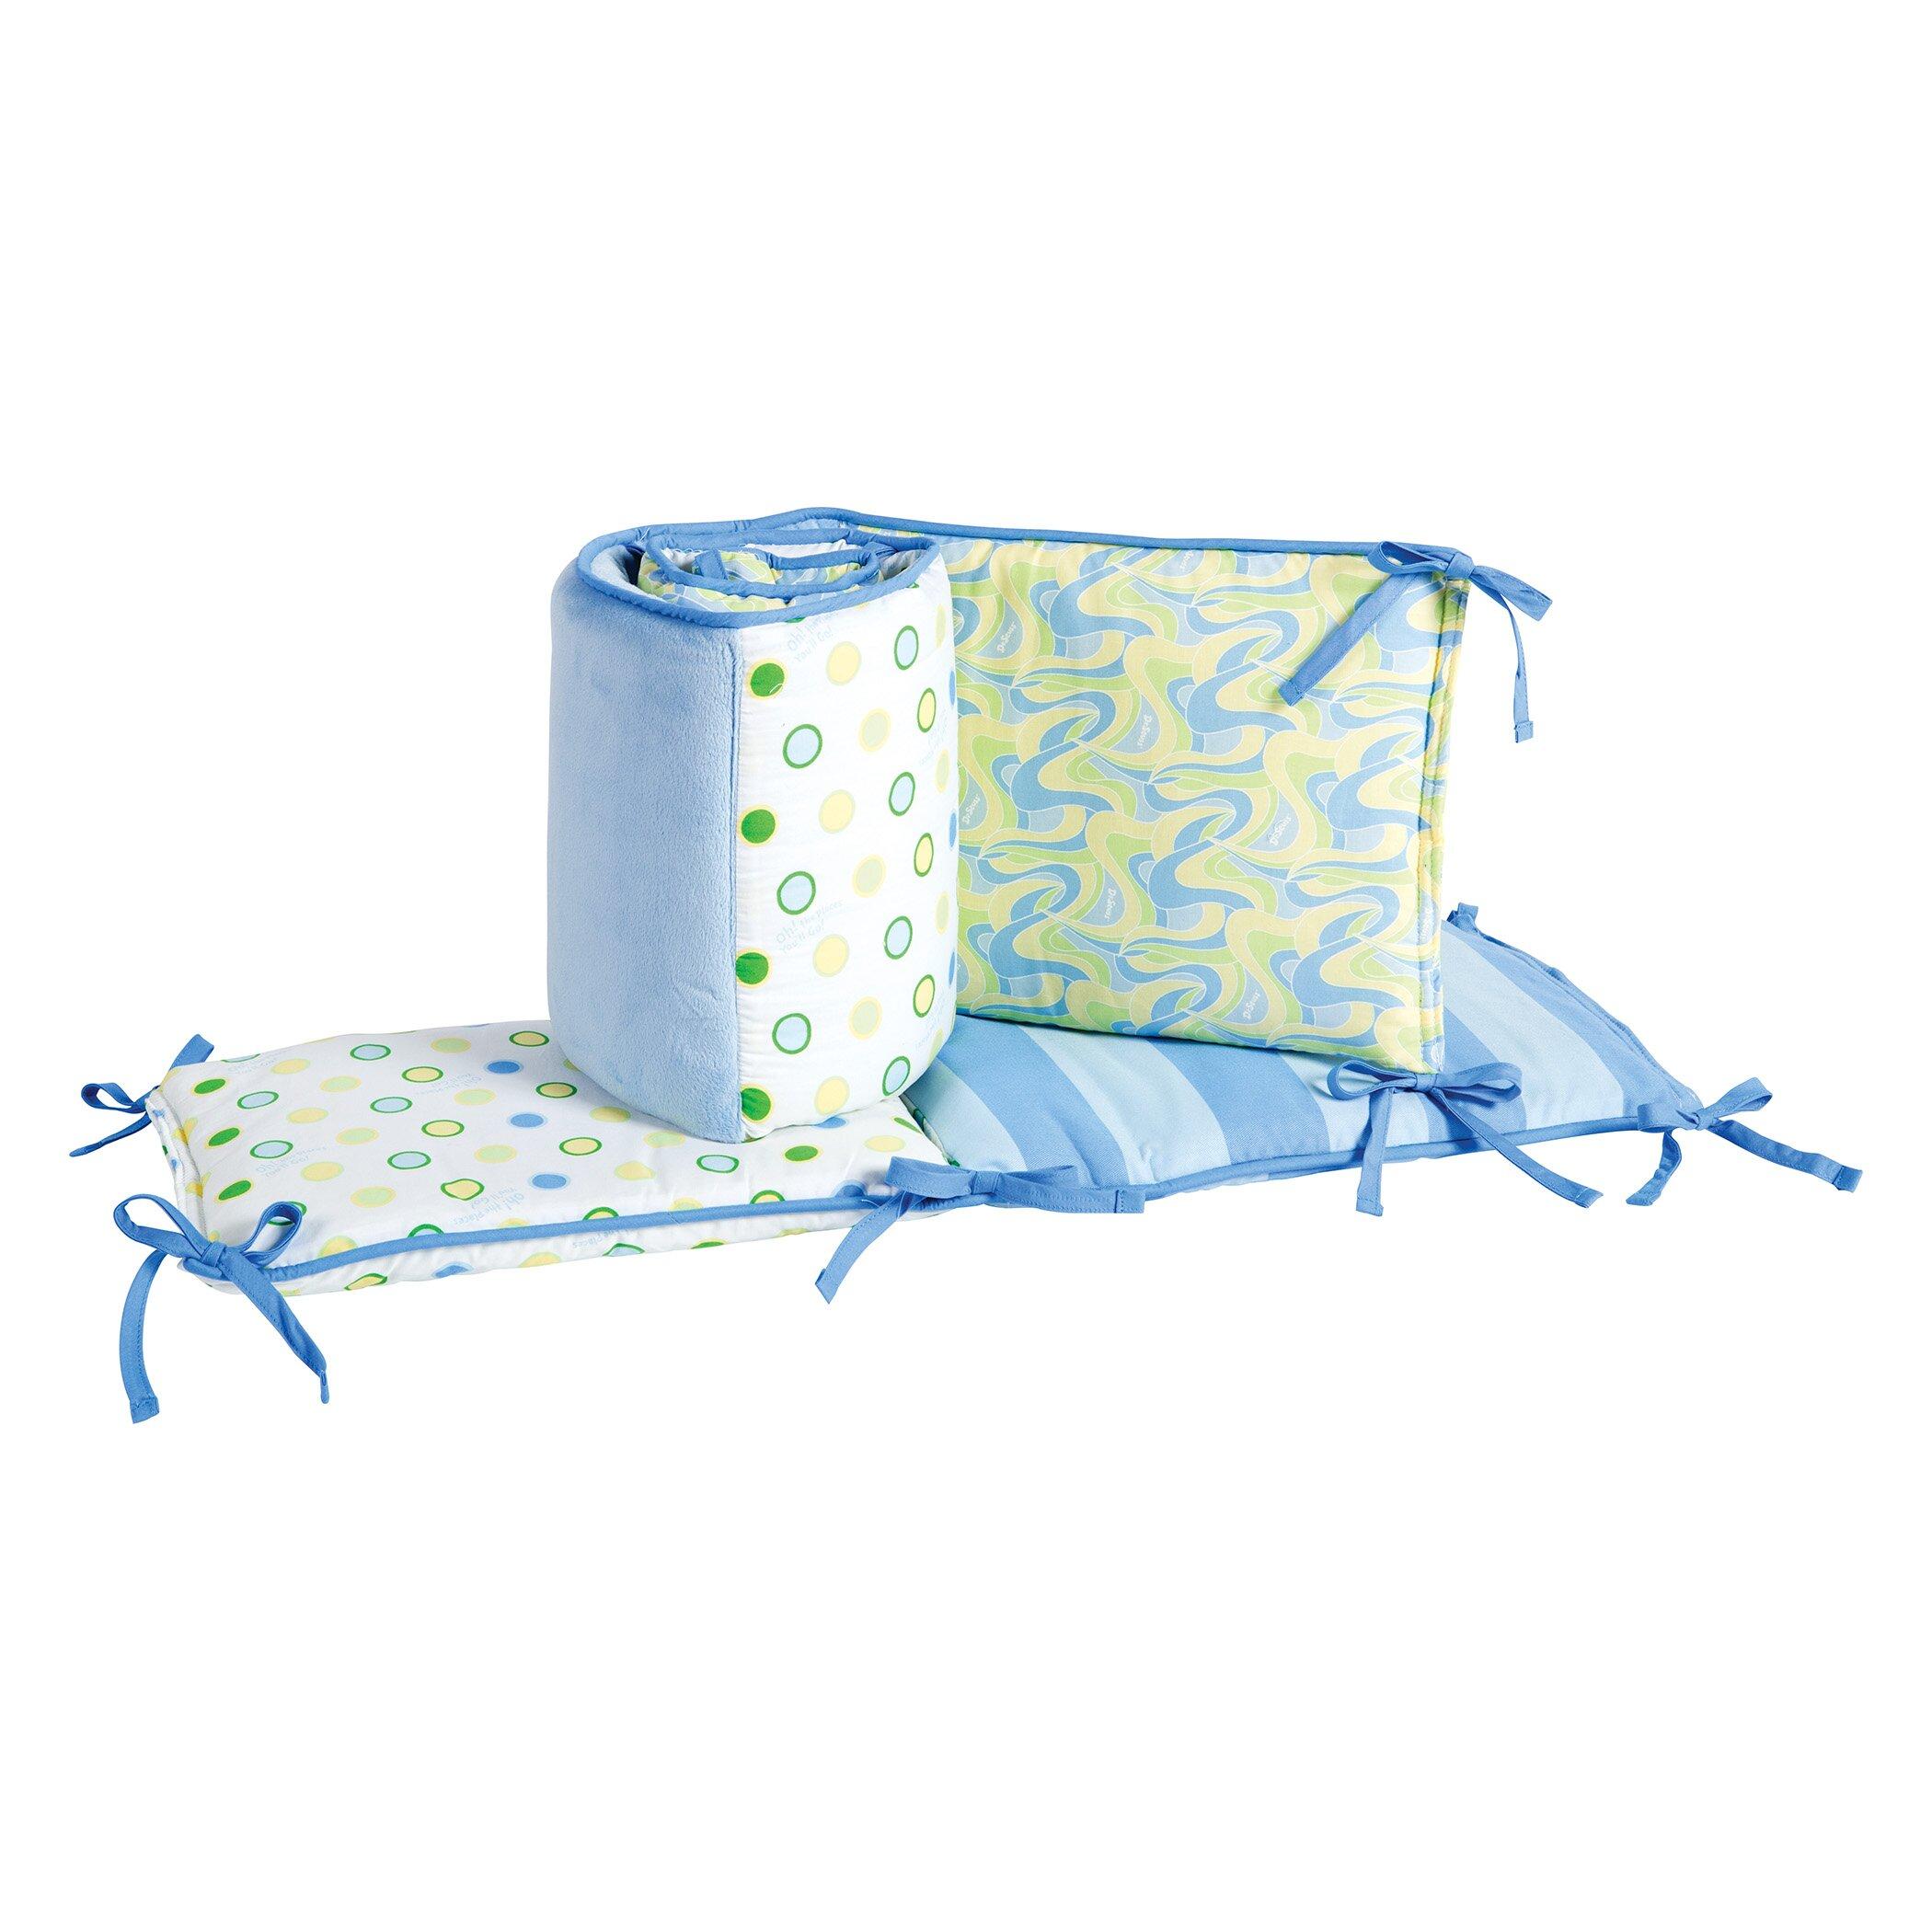 Dr Sueuss Baby Crib Bedding Set